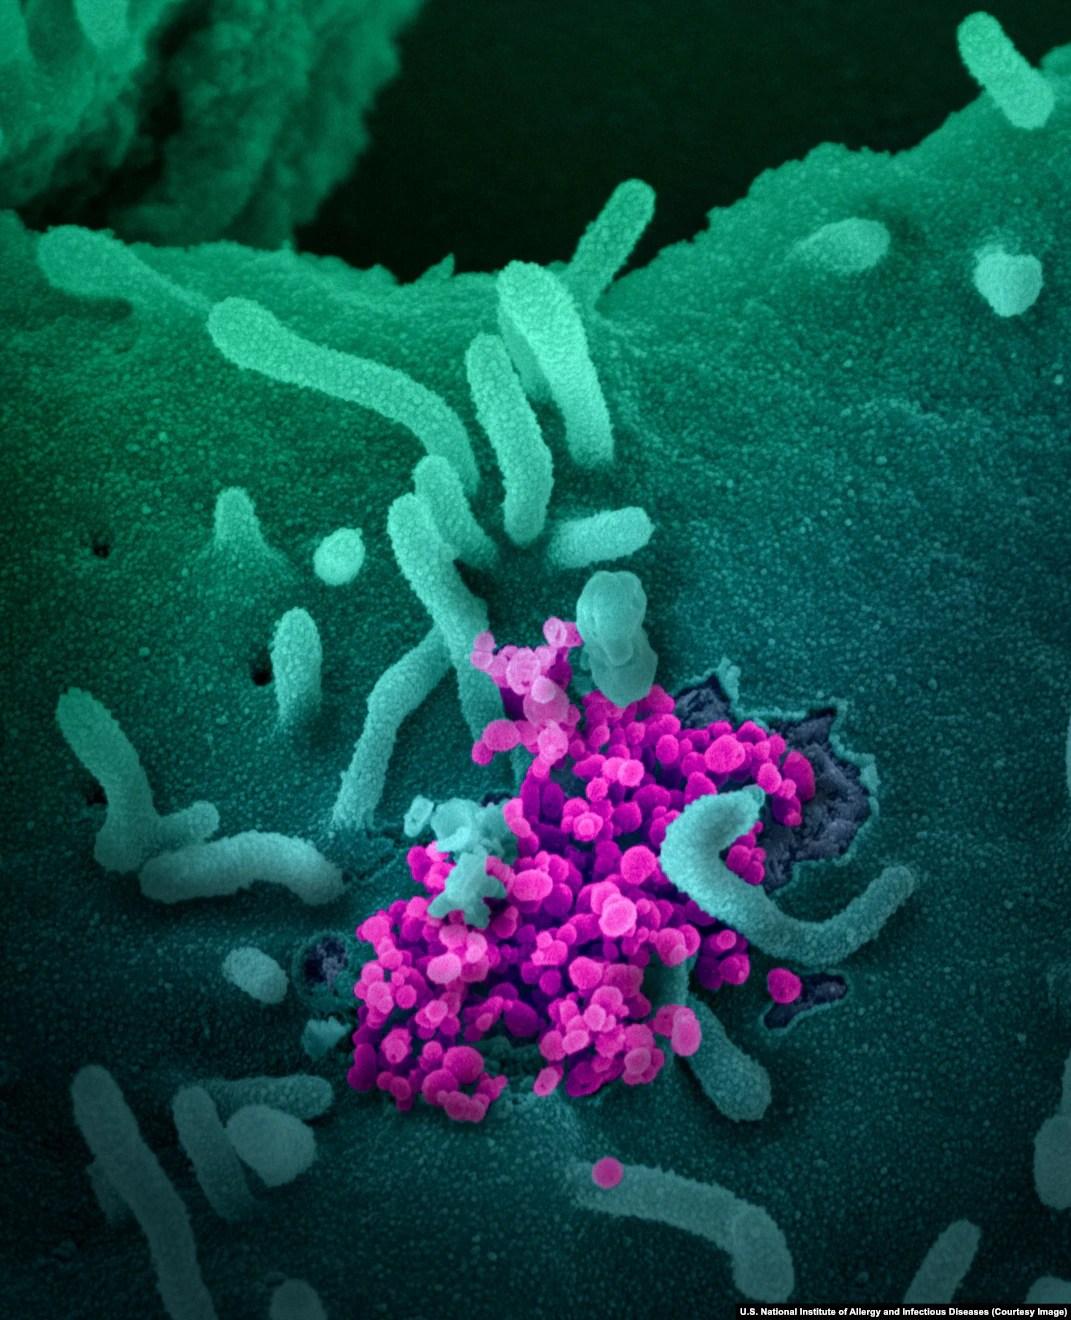 Covid 19 Virus Microscope